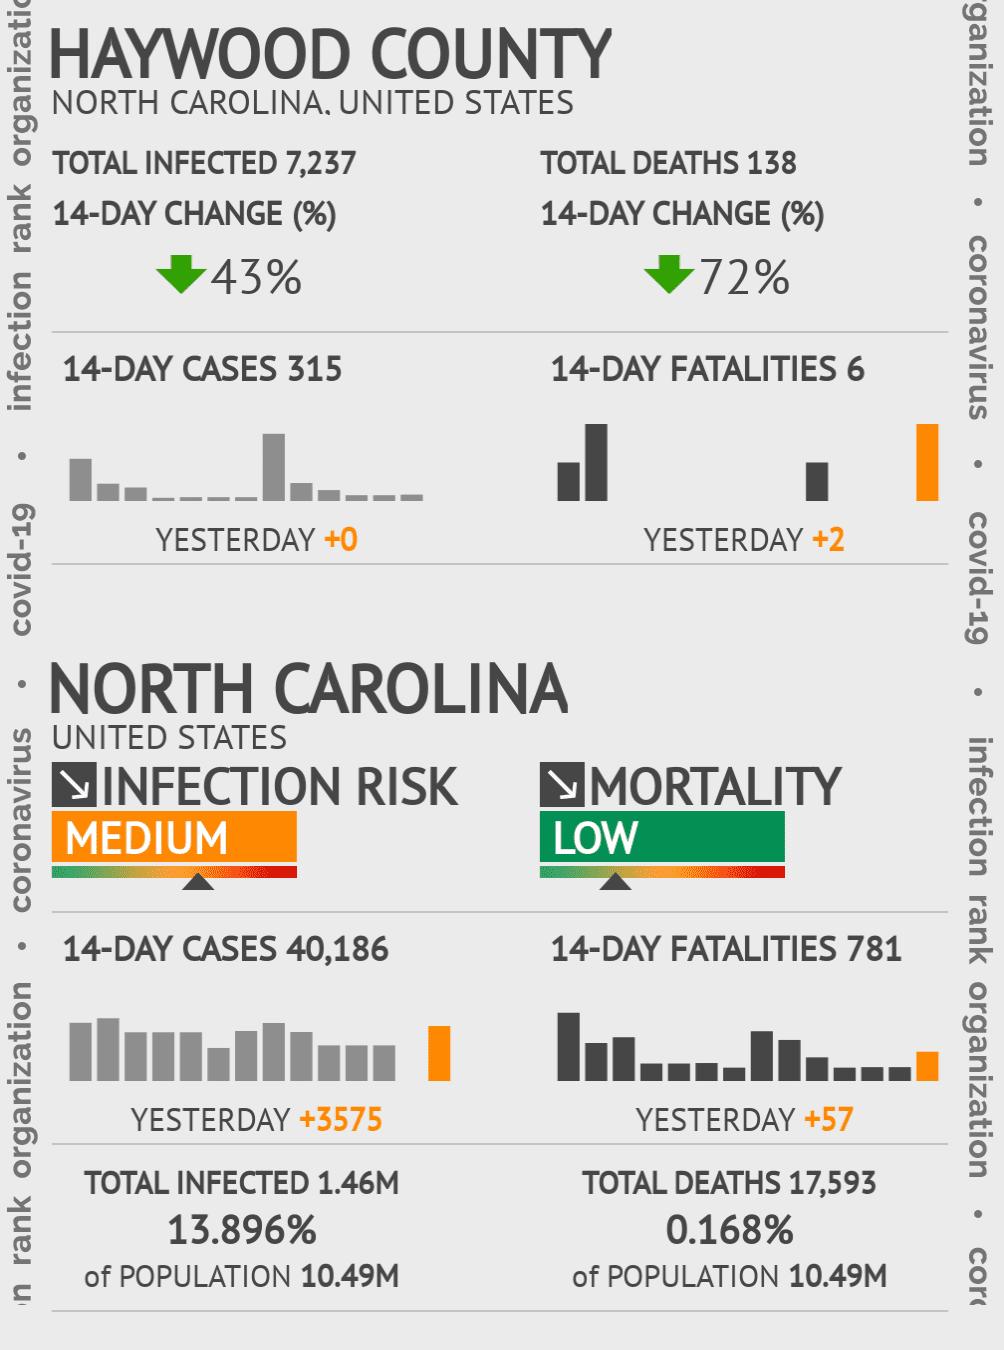 Haywood County Coronavirus Covid-19 Risk of Infection on November 29, 2020